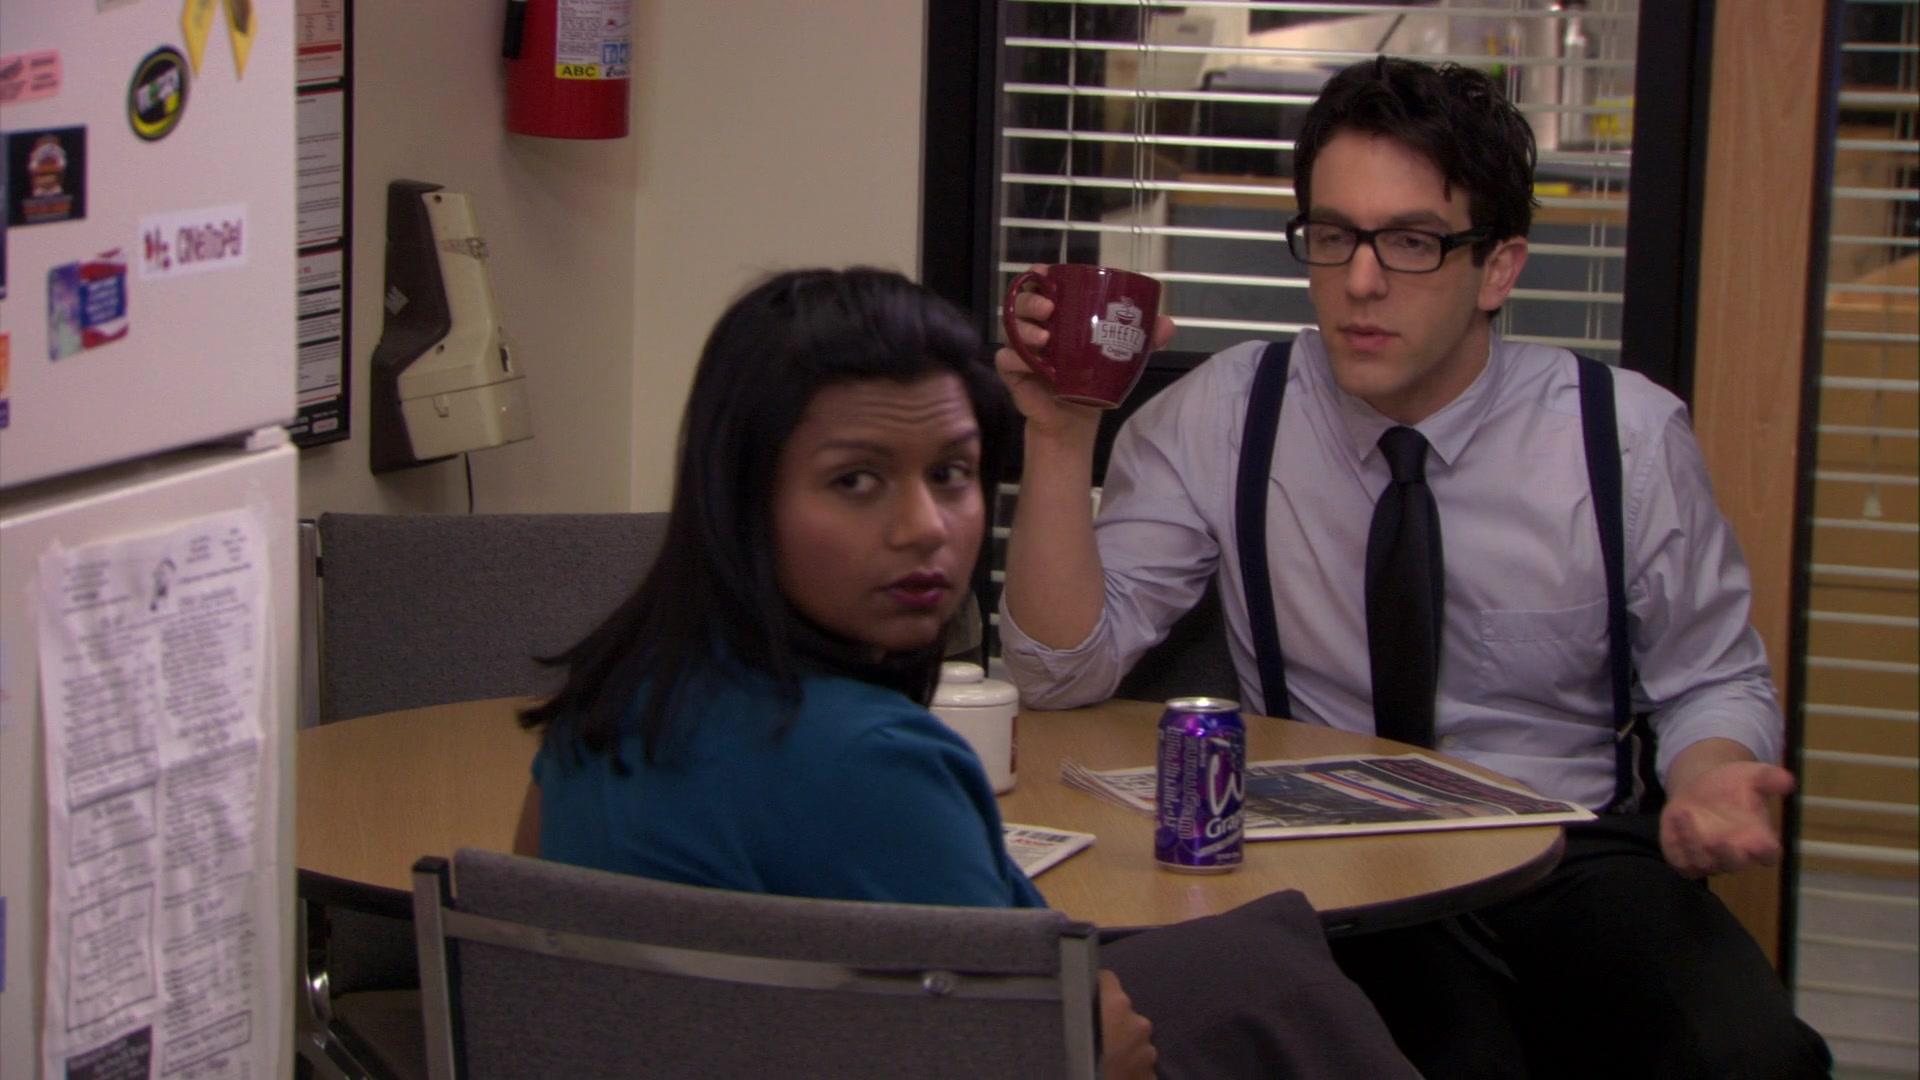 Wegmans Grape Drink Enjoyed By Mindy Kaling Kelly Kapoor And Sheetz Mug Held By B J Novak Ryan Howard In The Office Season 6 Episode 25 The Chump 2010